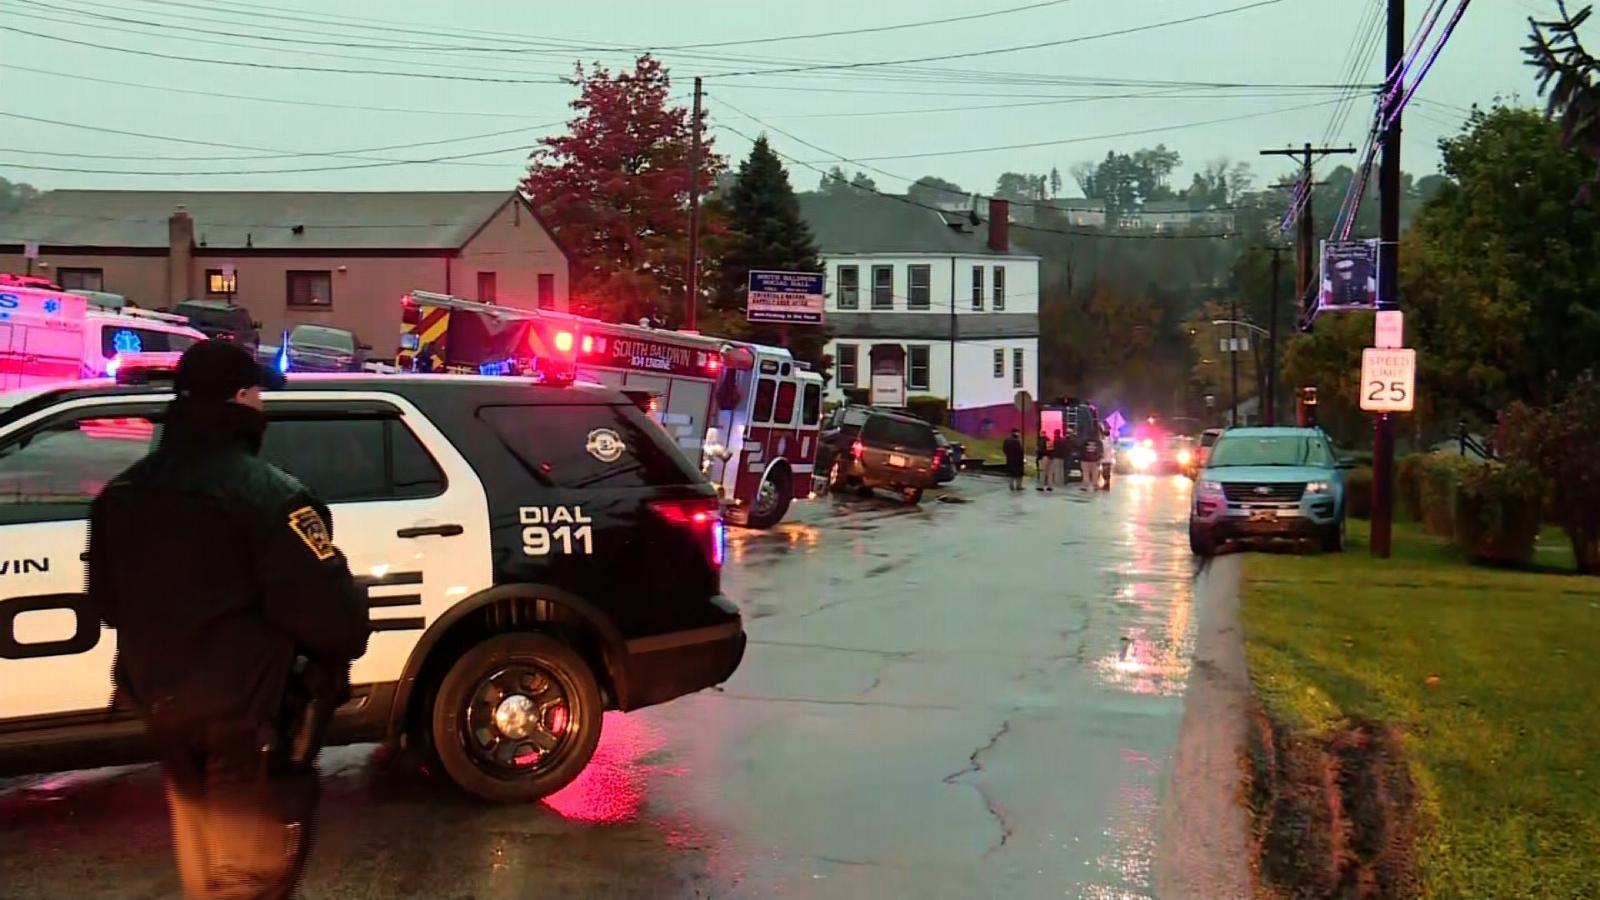 Investigators converge on suspect's home